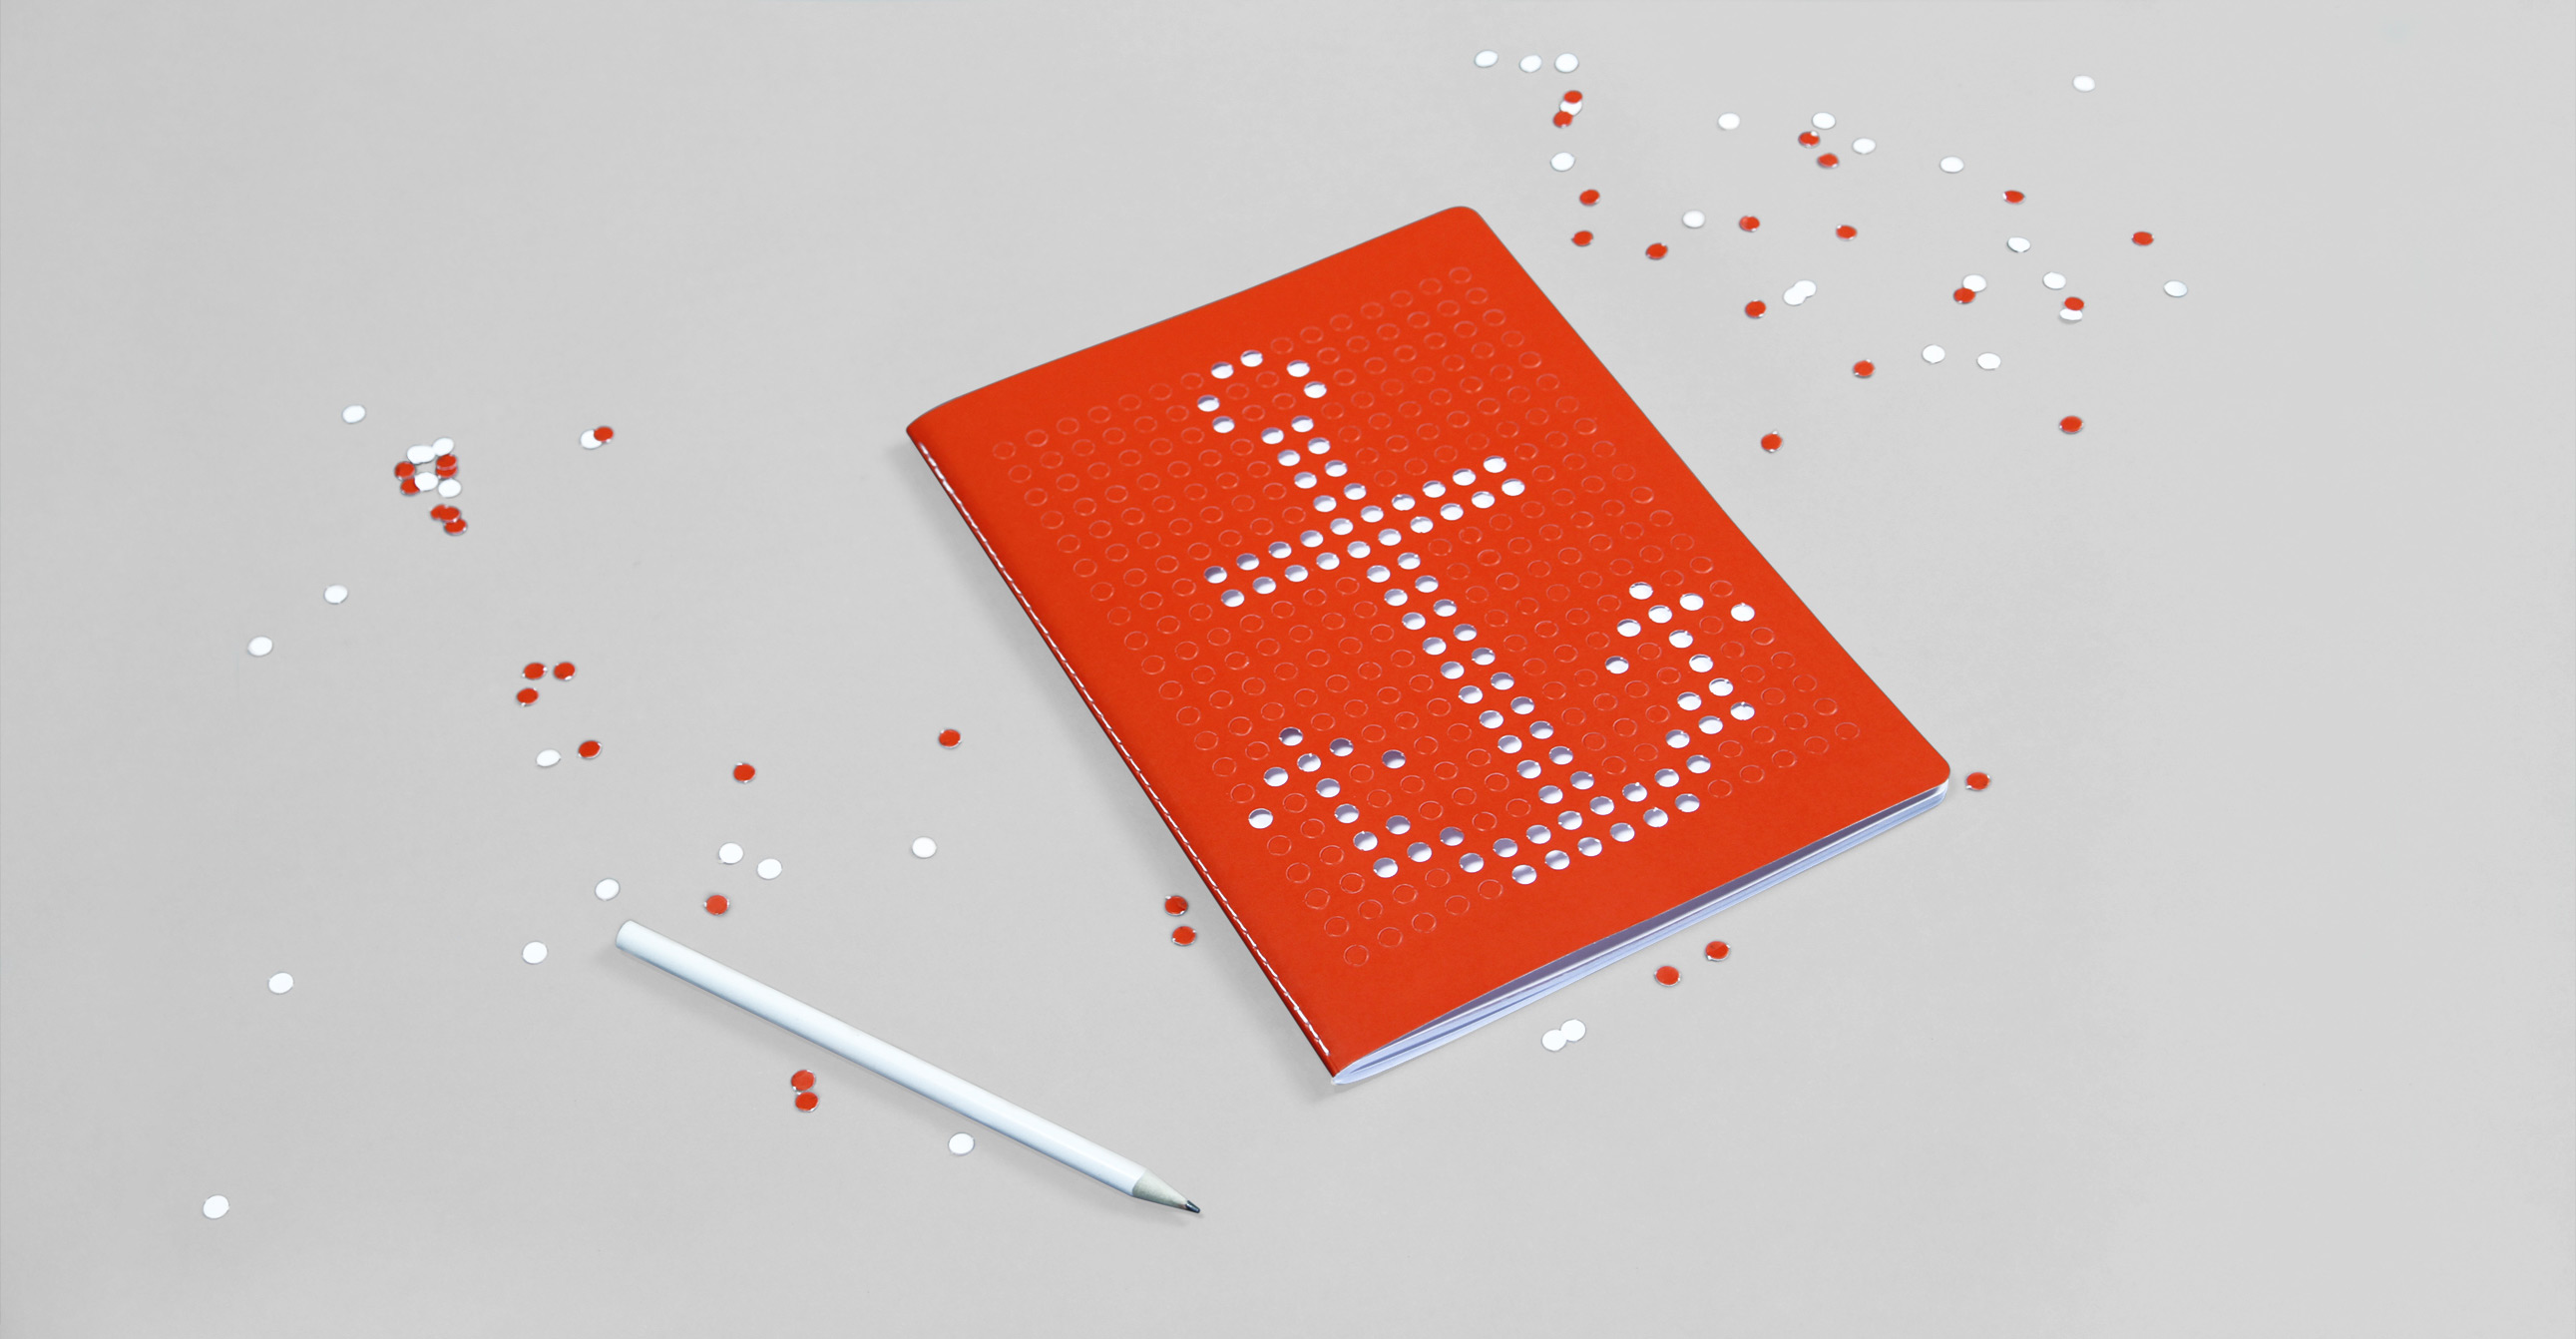 foundry-notebook-01.jpg